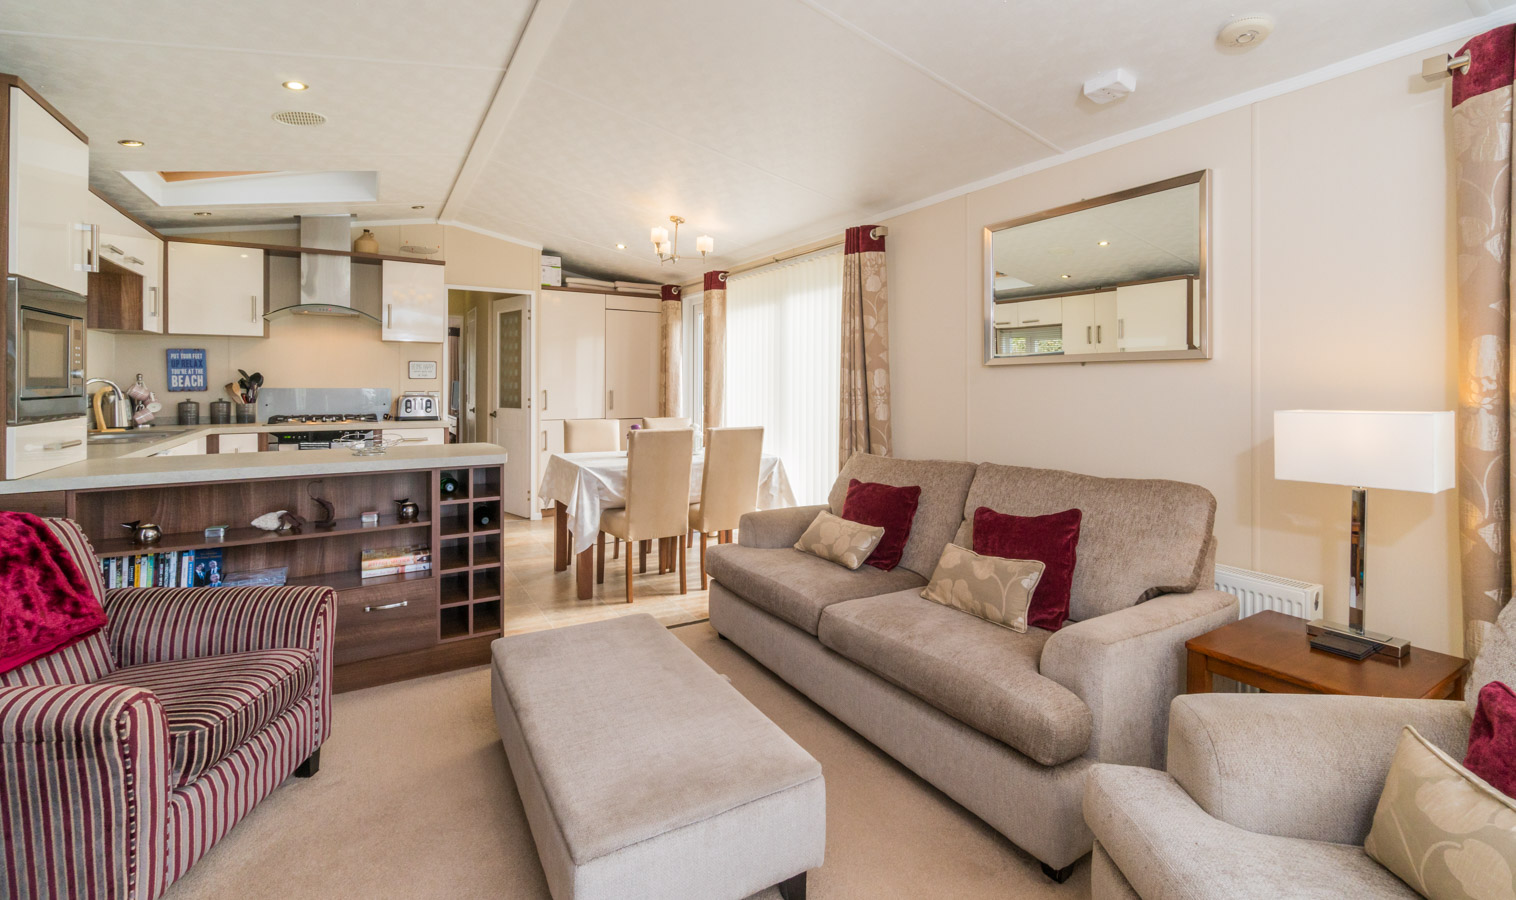 Neil-Bigwood-Monkton-Wyld-Holiday-Homes-50